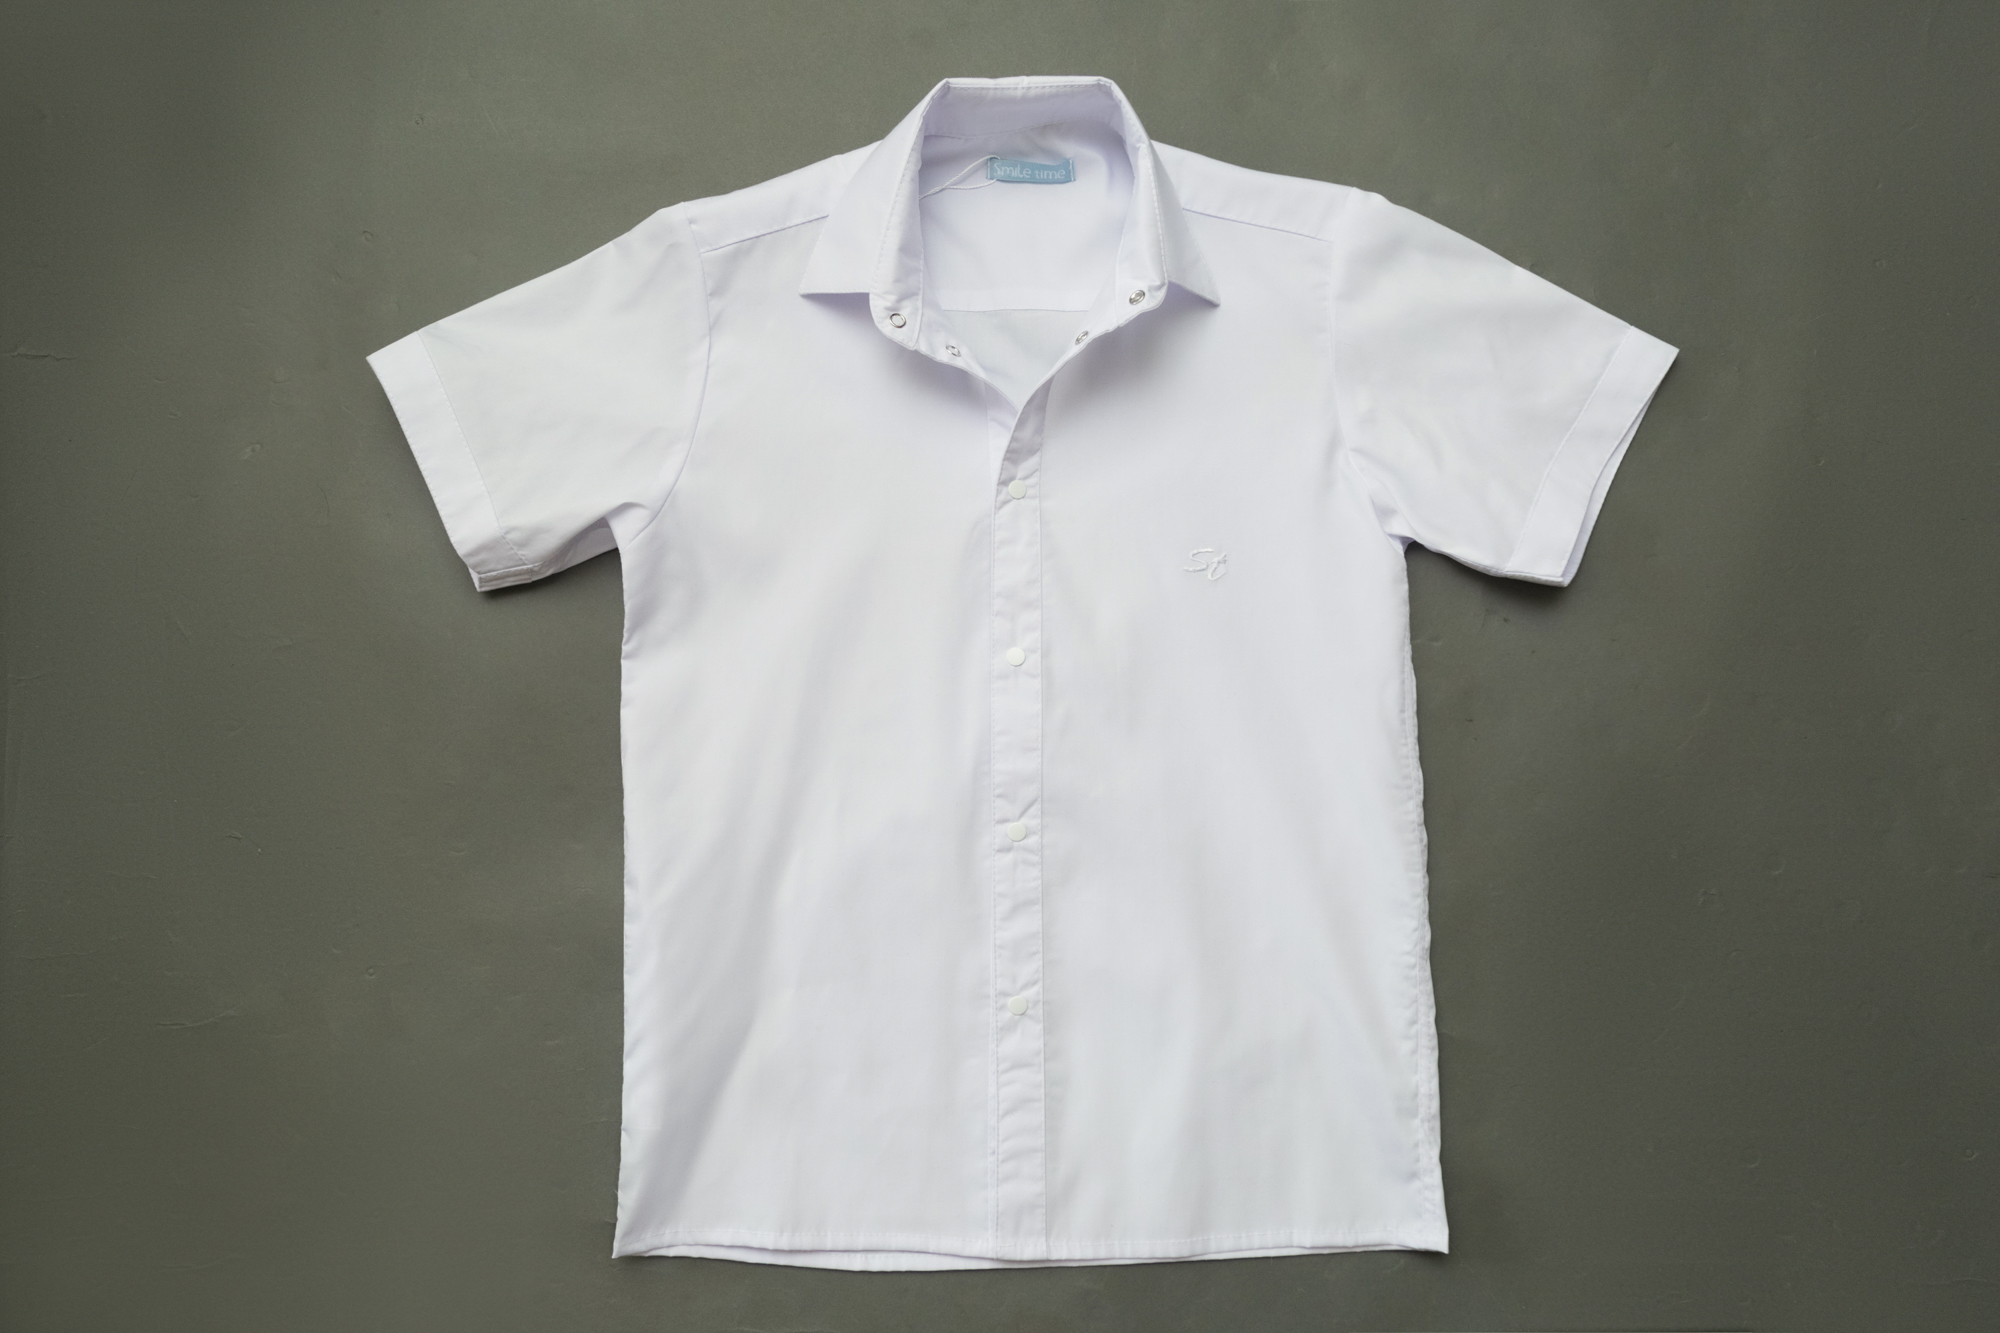 Рубашка для мальчика SmileTime с коротким рукавом Classic, белая